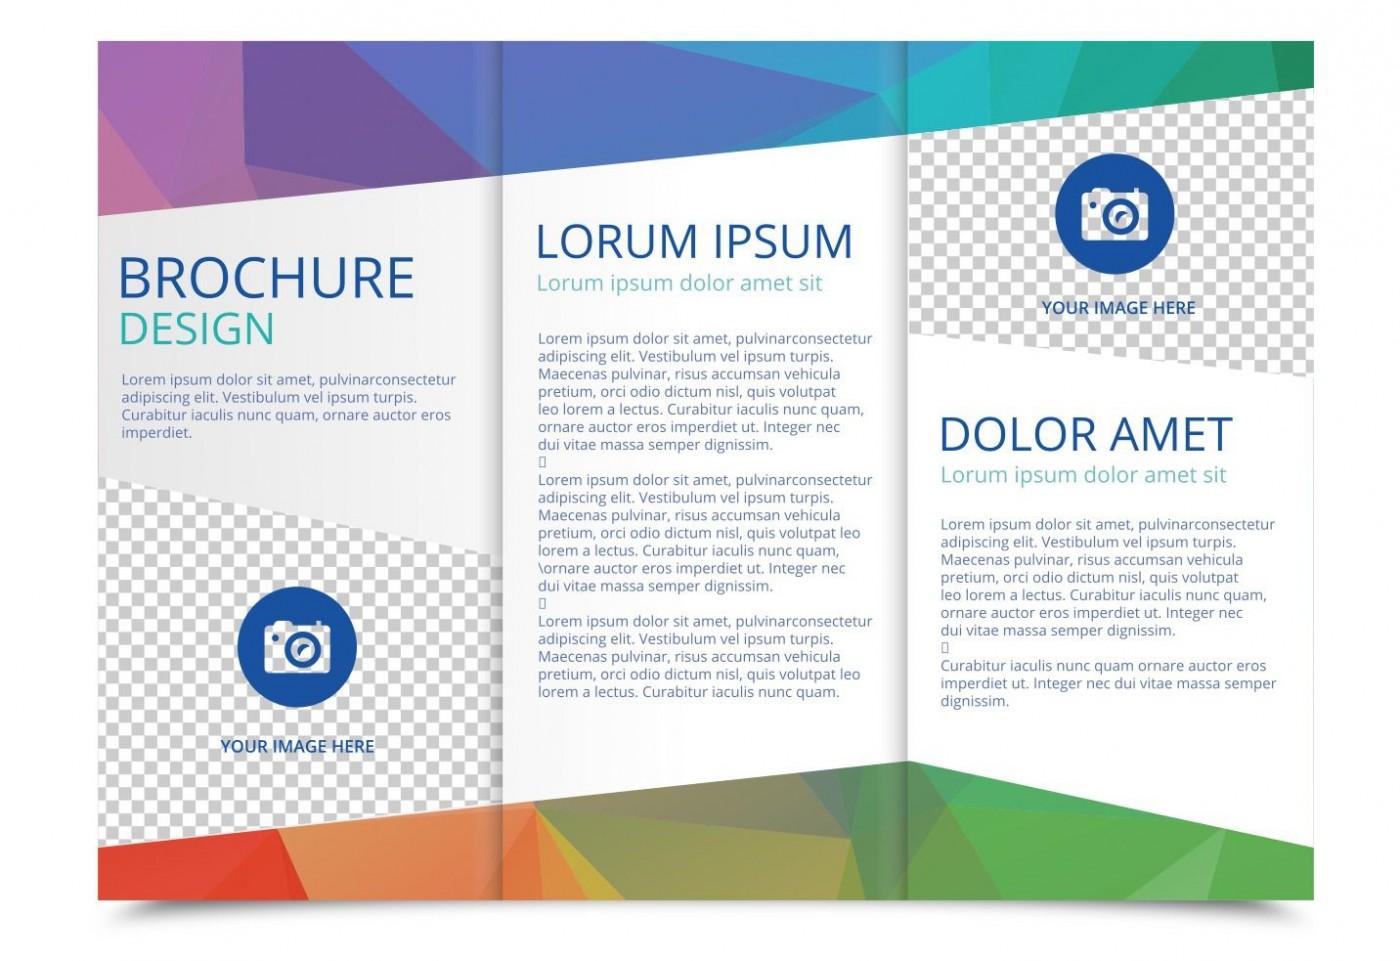 005 Impressive Free Tri Fold Brochure Template Sample  Microsoft Word 2010 Download Ai Downloadable For1400